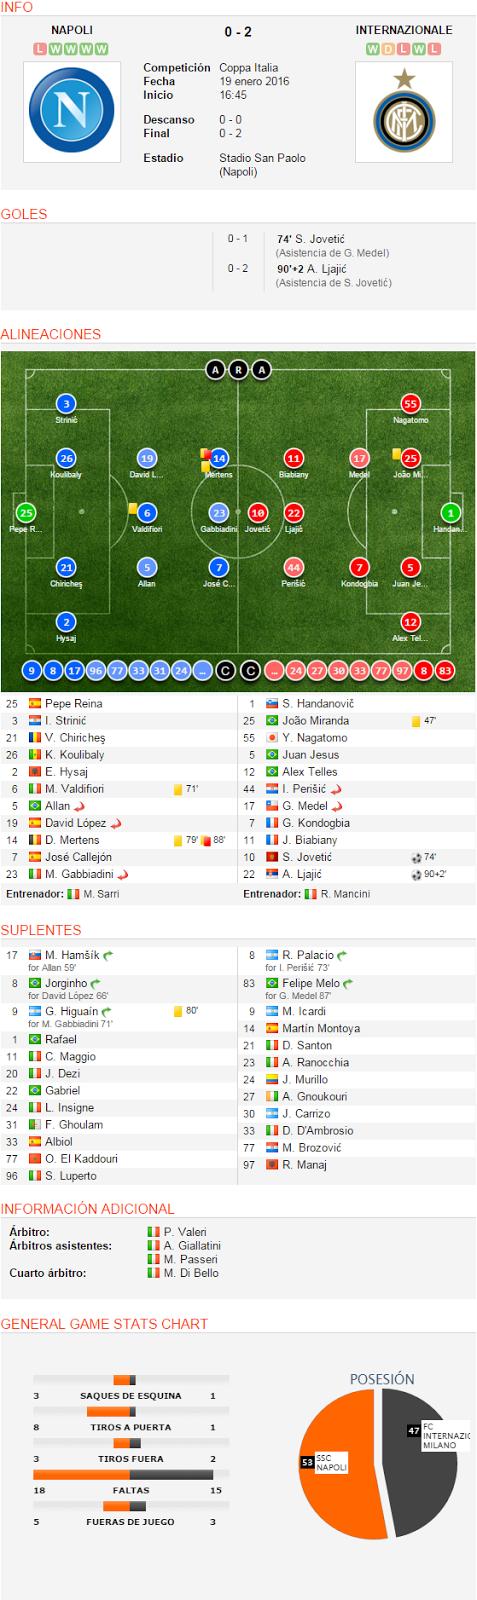 INFO NAPOLI LWWWW 0 - 2 INTERNAZIONALE WDLWL SSC Napoli CompeticiónCoppa ItaliaFecha19 enero 2016Inicio 16:45 Descanso0 - 0Final0 - 2 EstadioStadio San Paolo (Napoli) FC Internazionale Milano GOLES 0 - 1 74' S. Jovetić (Asistencia de G. Medel) 0 - 2 90'+2 A. Ljajić (Asistencia de S. Jovetić) ALINEACIONES 25 Pepe Reina 3 I. Strinić 21 V. Chiricheş 26 K. Koulibaly 2 E. Hysaj 6 M. Valdifiori 71' 5 Allan Sustituido 19 David López Sustituido 14 D. Mertens 79' 88' 7 José Callejón 23 M. Gabbiadini Sustituido Entrenador: M. Sarri 1 S. Handanovič 25 João Miranda 47' 55 Y. Nagatomo 5 Juan Jesus 12 Alex Telles 44 I. Perišić Sustituido 17 G. Medel Sustituido 7 G. Kondogbia 11 J. Biabiany 10 S. Jovetić 74' 22 A. Ljajić 90+2' Entrenador: R. Mancini SUPLENTES 17 M. Hamšík Sustituido for Allan 59' 8 Jorginho Sustituido for David López 66' 9 G. Higuaín Sustituido for M. Gabbiadini 71' 80' 1 Rafael 11 C. Maggio 20 J. Dezi 22 Gabriel 24 L. Insigne 31 F. Ghoulam 33 Albiol 77 O. El Kaddouri 96 S. Luperto 8 R. Palacio Sustituido for I. Perišić 73' 83 Felipe Melo Sustituido for G. Medel 87' 9 M. Icardi 14 Martín Montoya 21 D. Santon 23 A. Ranocchia 24 J. Murillo 27 A. Gnoukouri 30 J. Carrizo 33 D. D'Ambrosio 77 M. Brozović 97 R. Manaj INFORMACIÓN ADICIONAL Árbitro:P. ValeriÁrbitros asistentes:A. Giallatini M. Passeri Cuarto árbitro:M. Di Bello GENERAL GAME STATS CHART